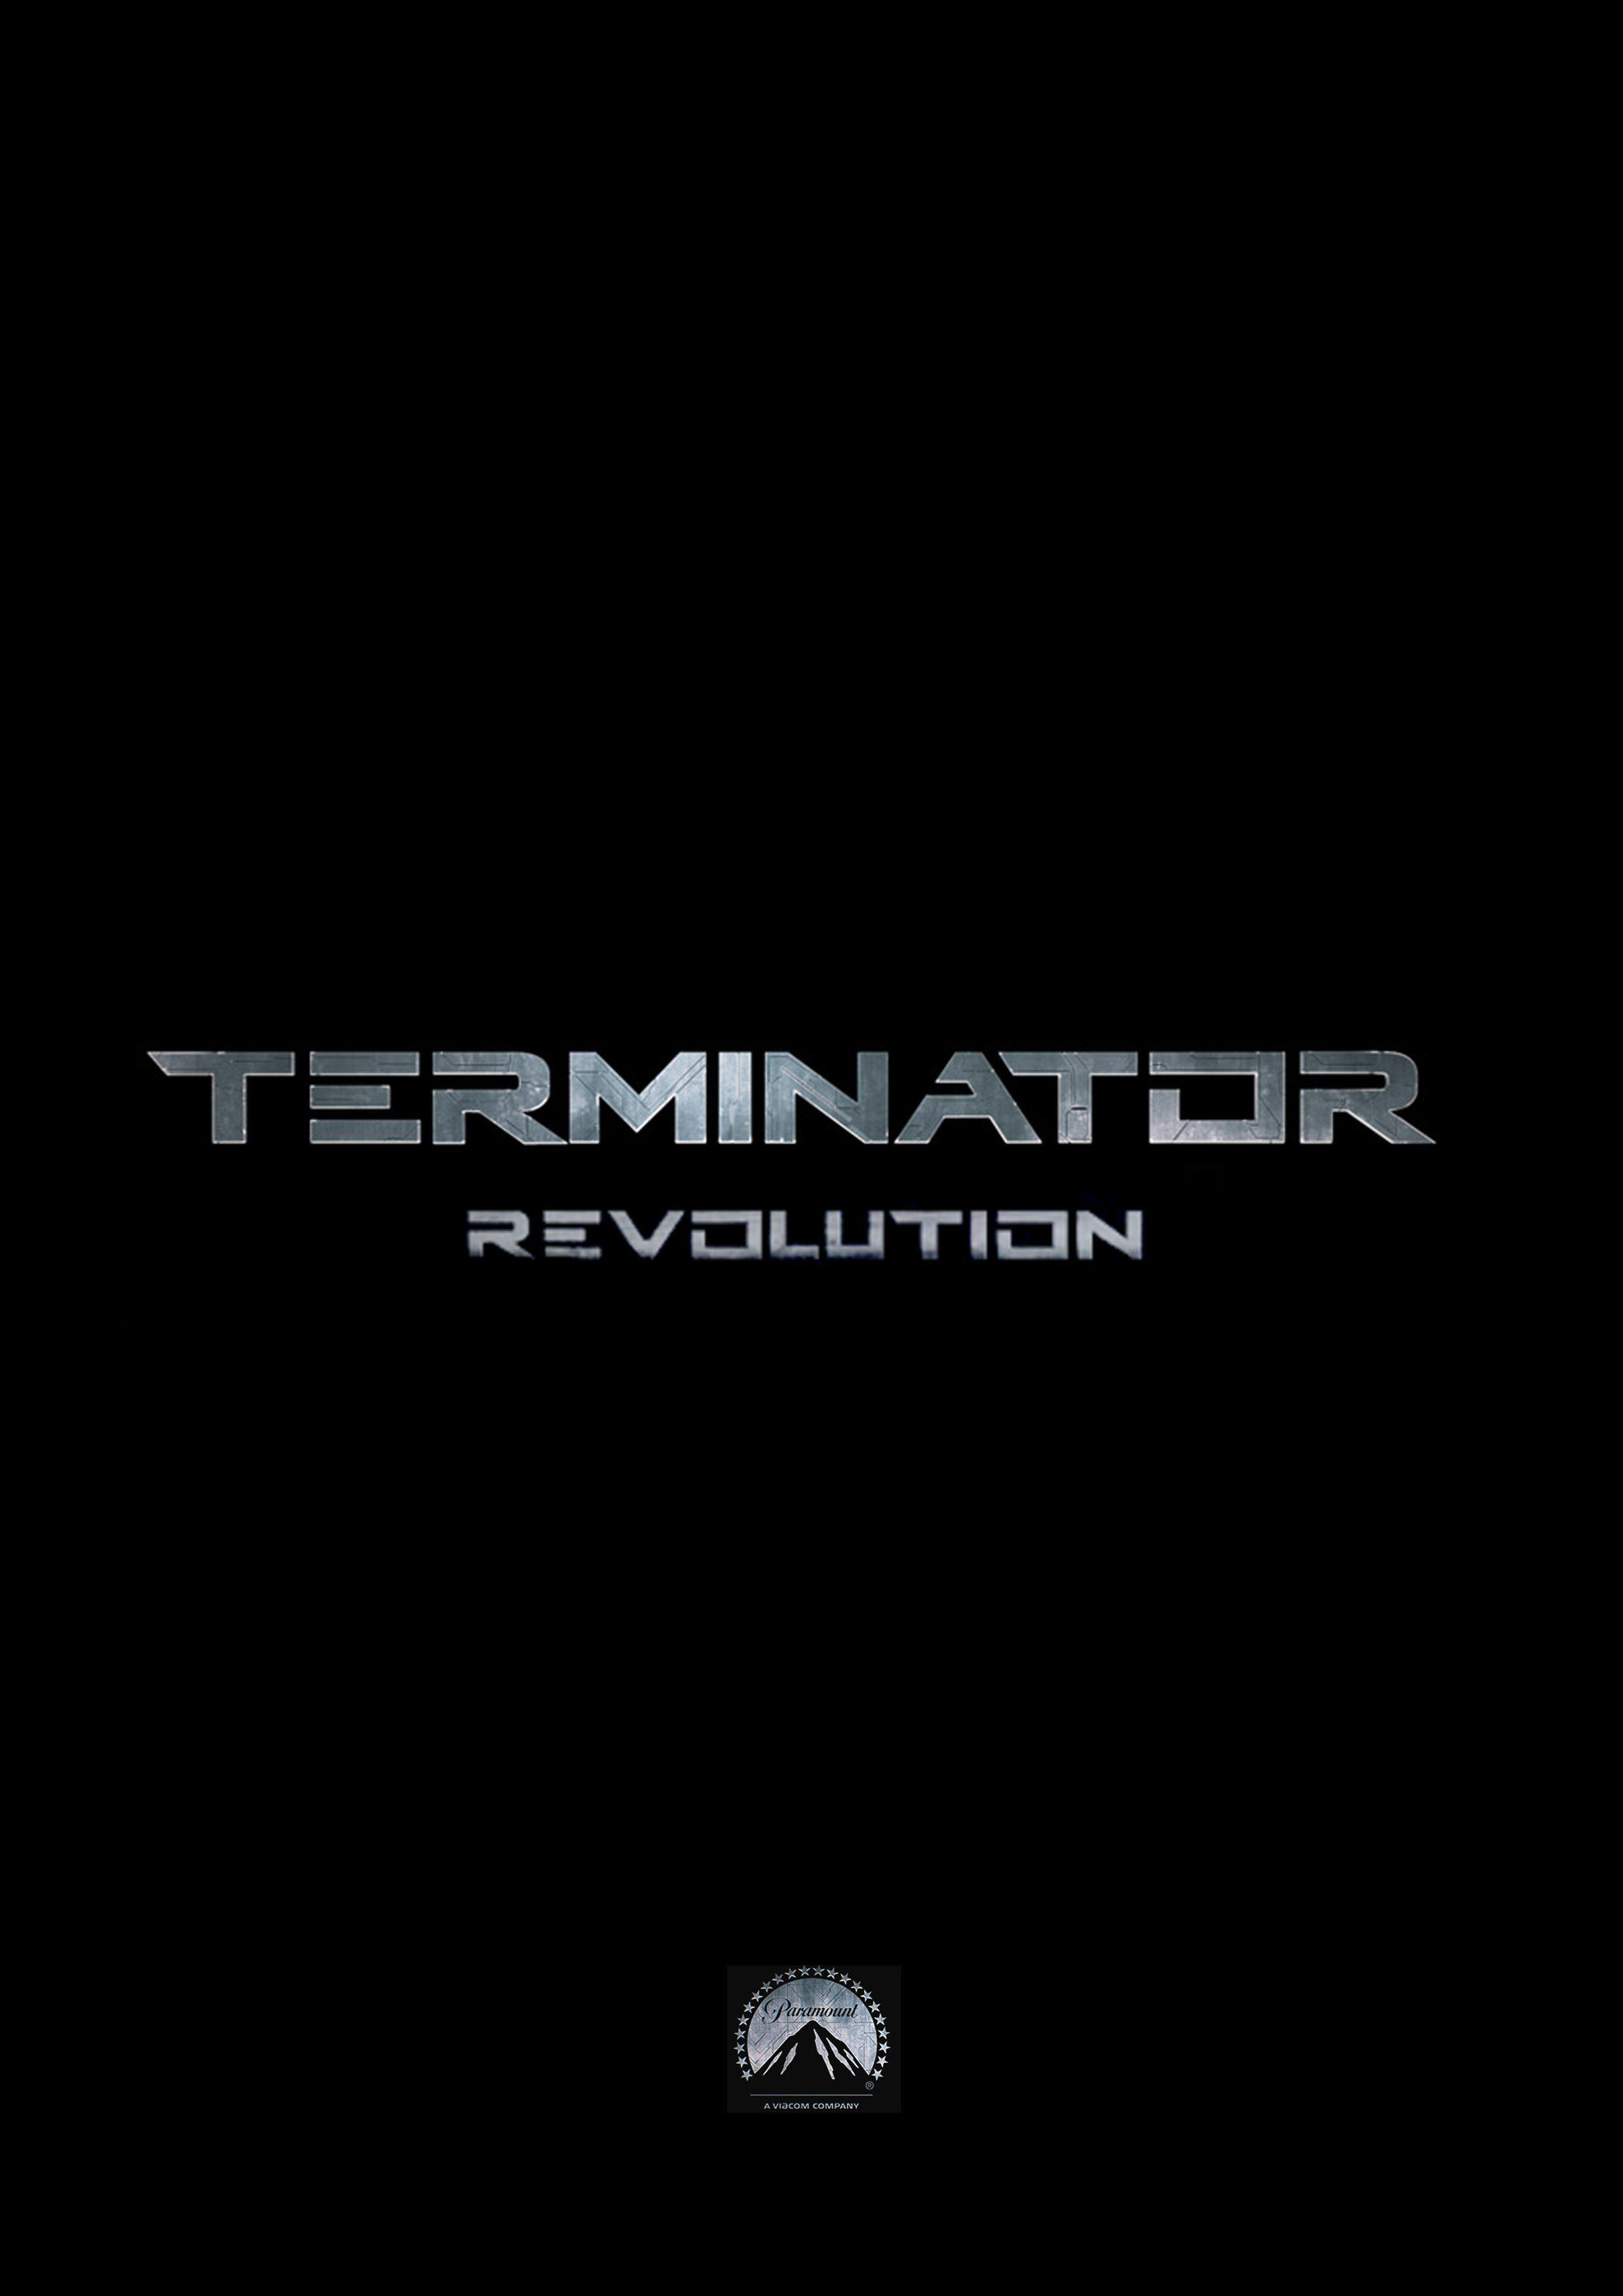 Terminator Dark Fate Film 2019 Senscritique Terminator Dark Fate Film 2019 Senscritique Terminator Dark Fate Est Un Film Tim Mill Terminator Film Trailer